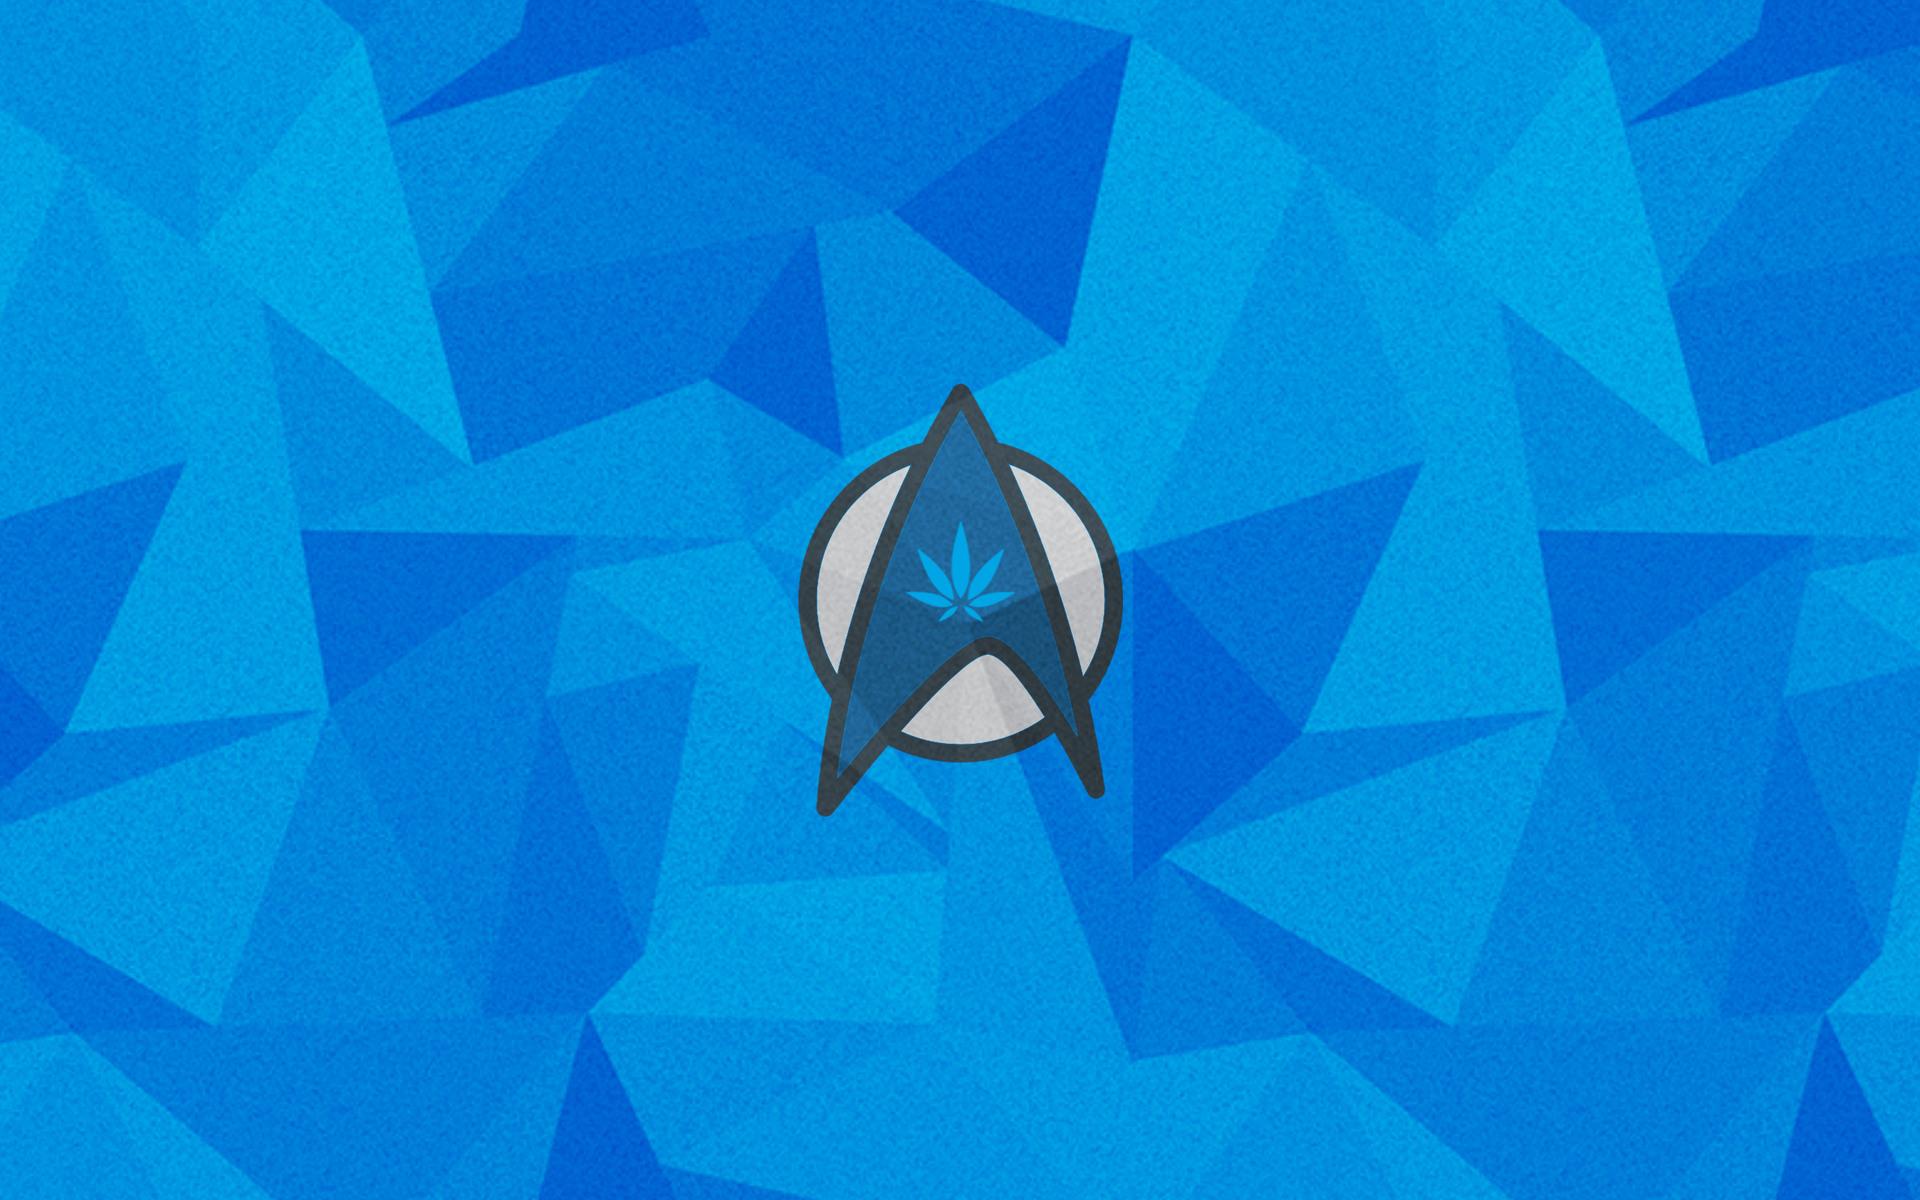 id-logo-5k-oc.jpg